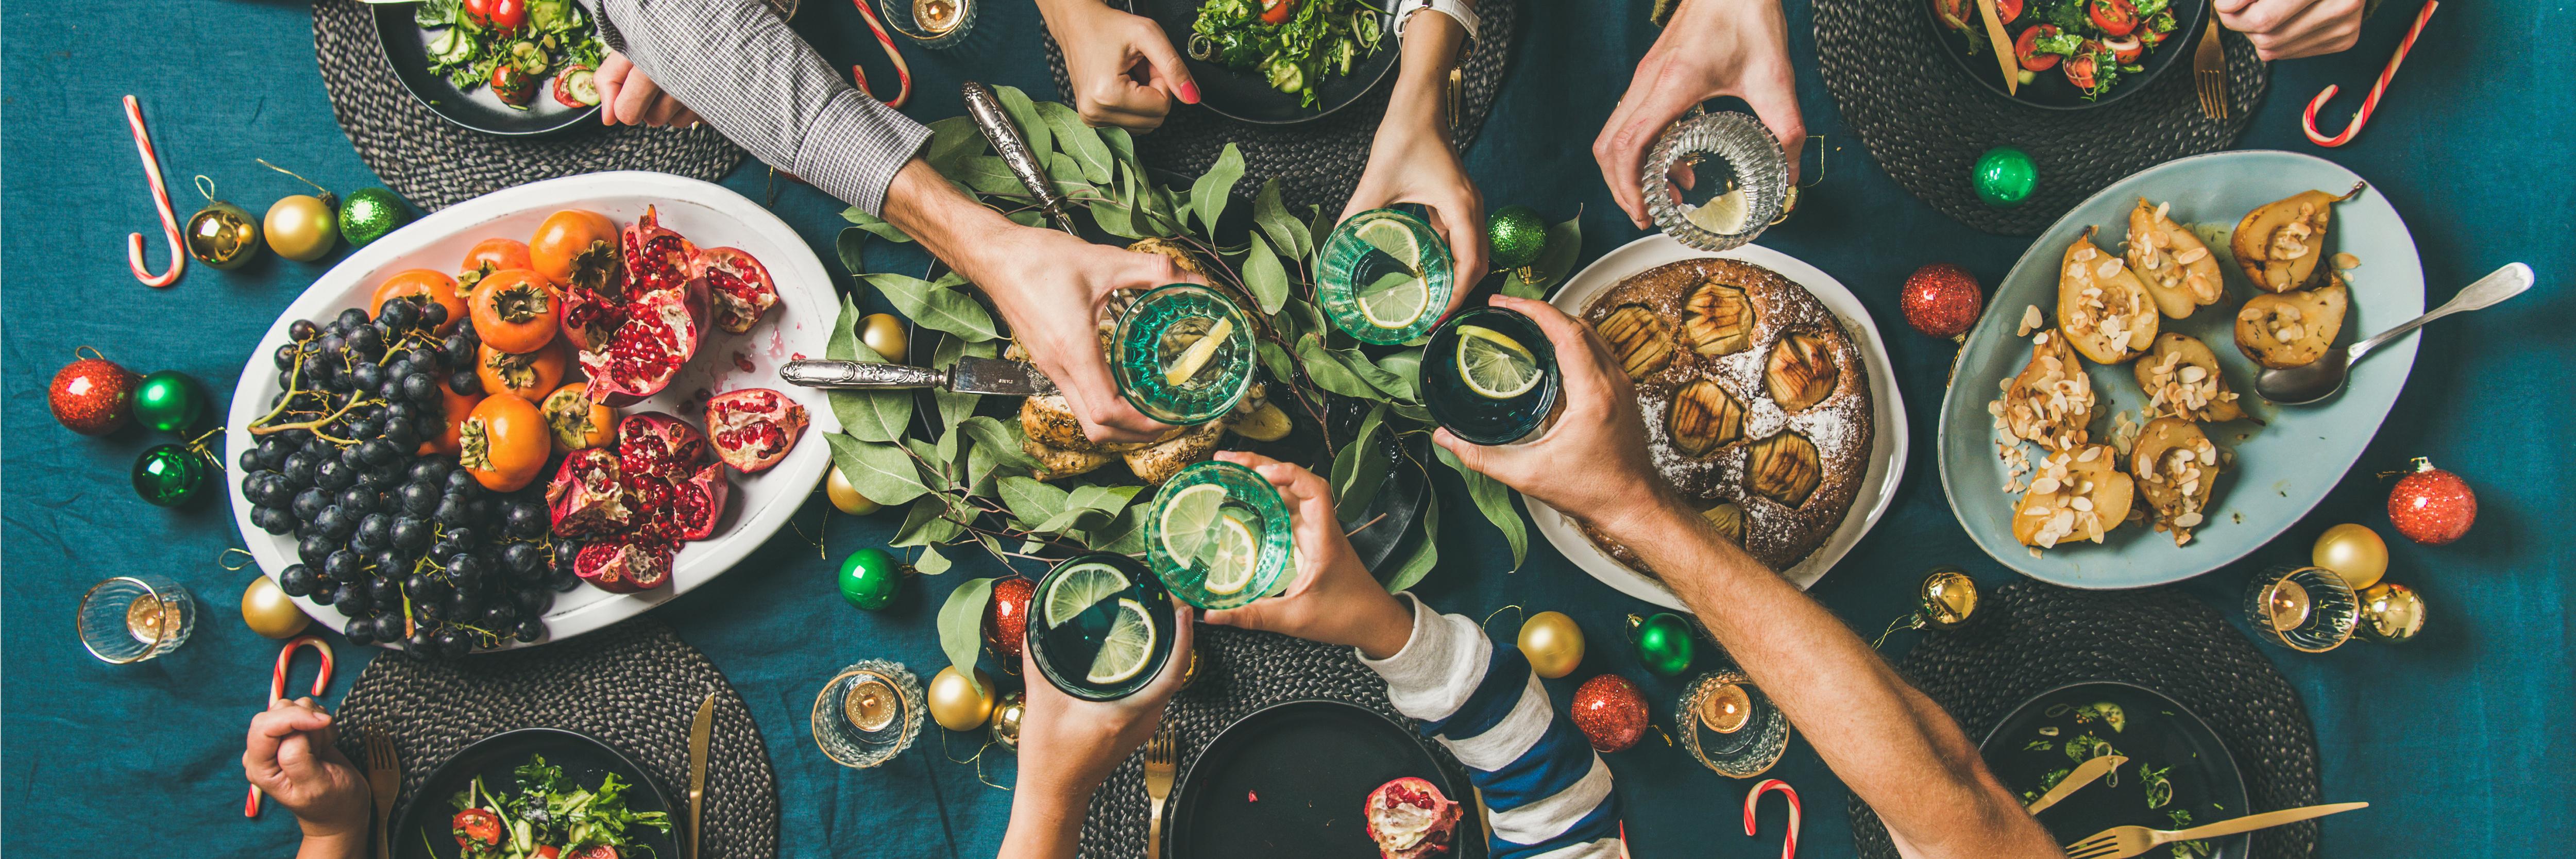 Menu Noël éco-responsable 2019 Energic